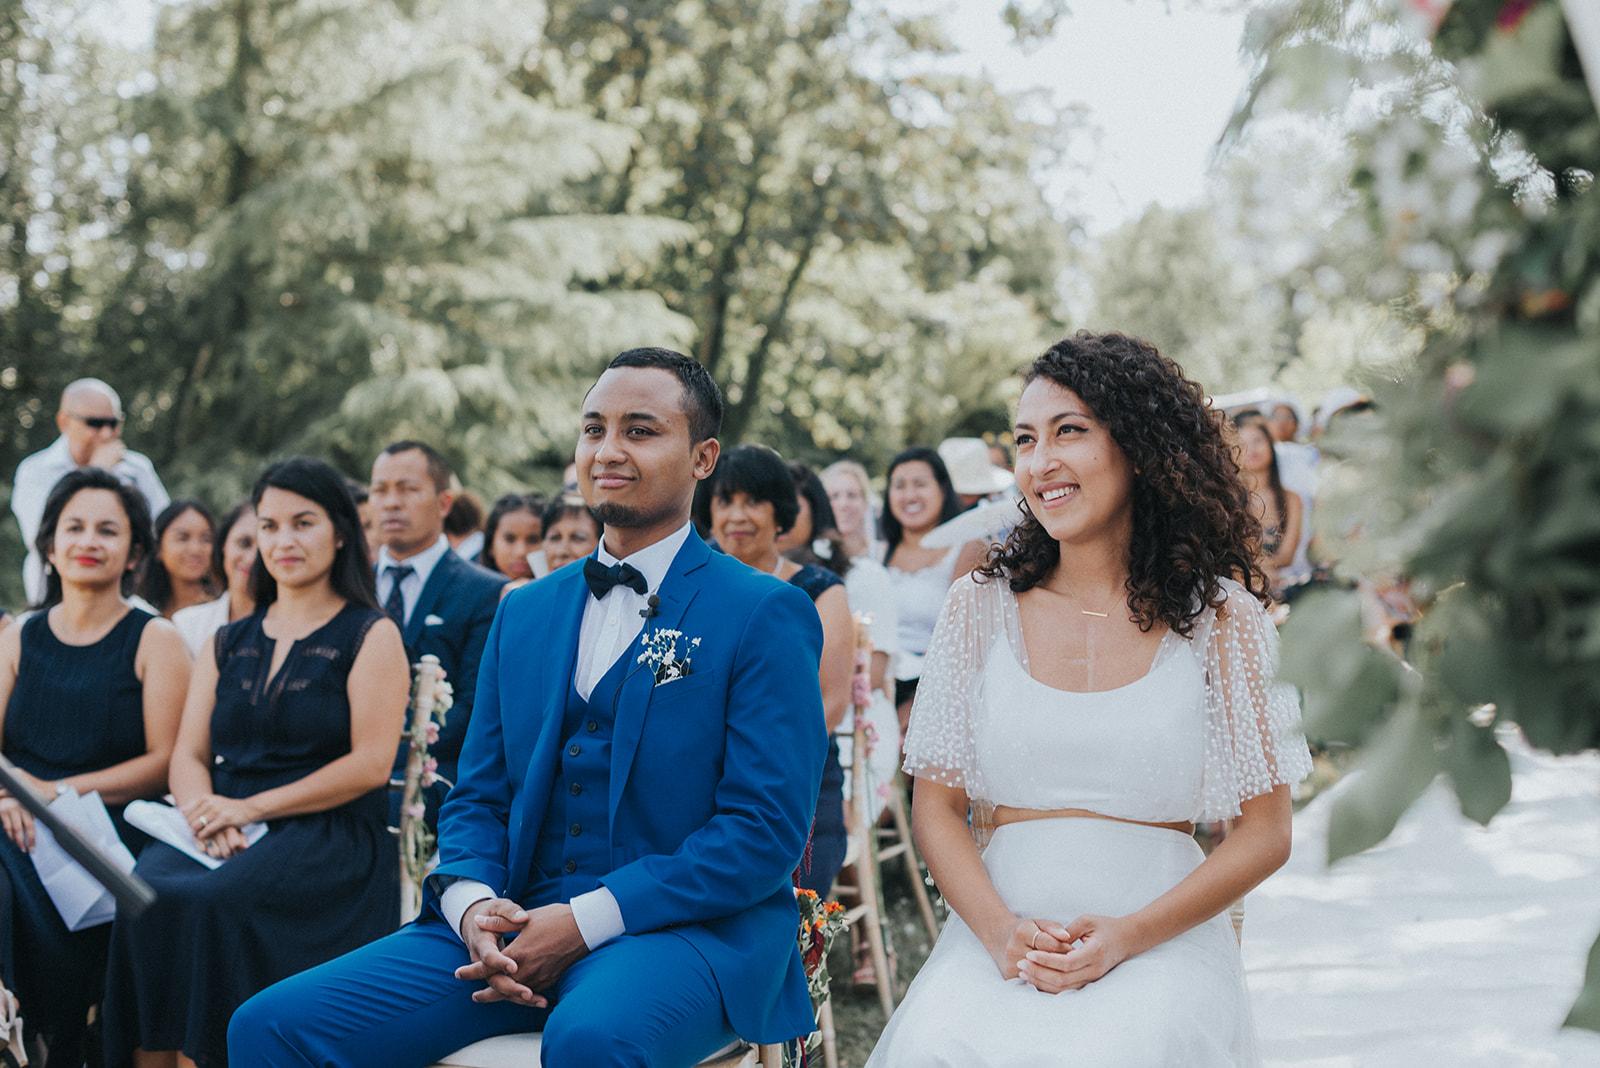 Mariage de Teddy et Arielle-250.jpg